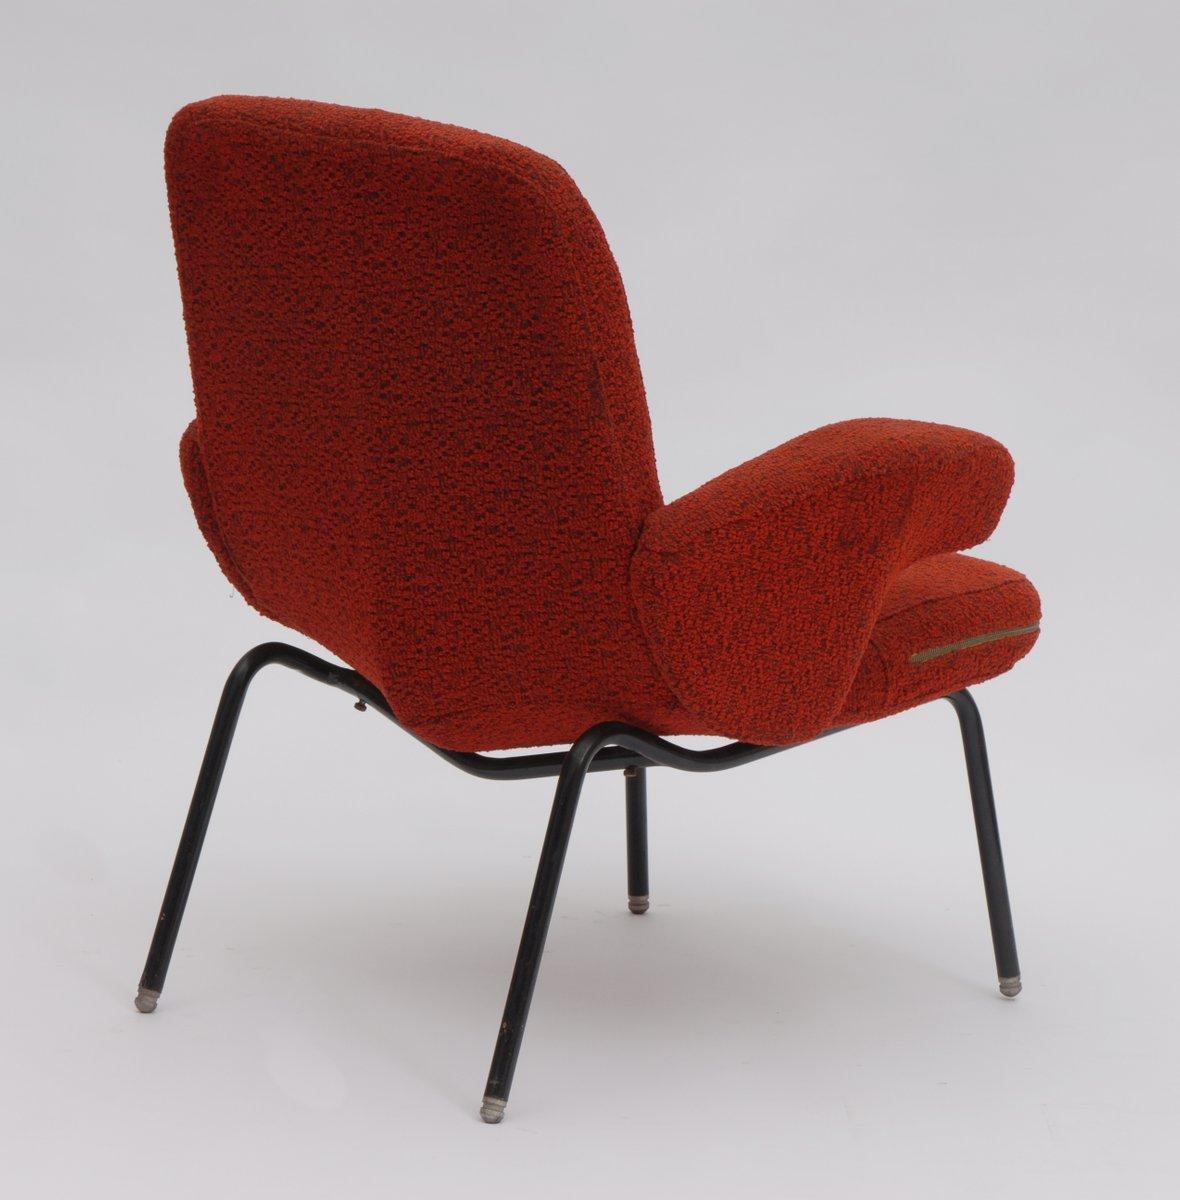 mid century sessel von alan fuchs bei pamono kaufen. Black Bedroom Furniture Sets. Home Design Ideas